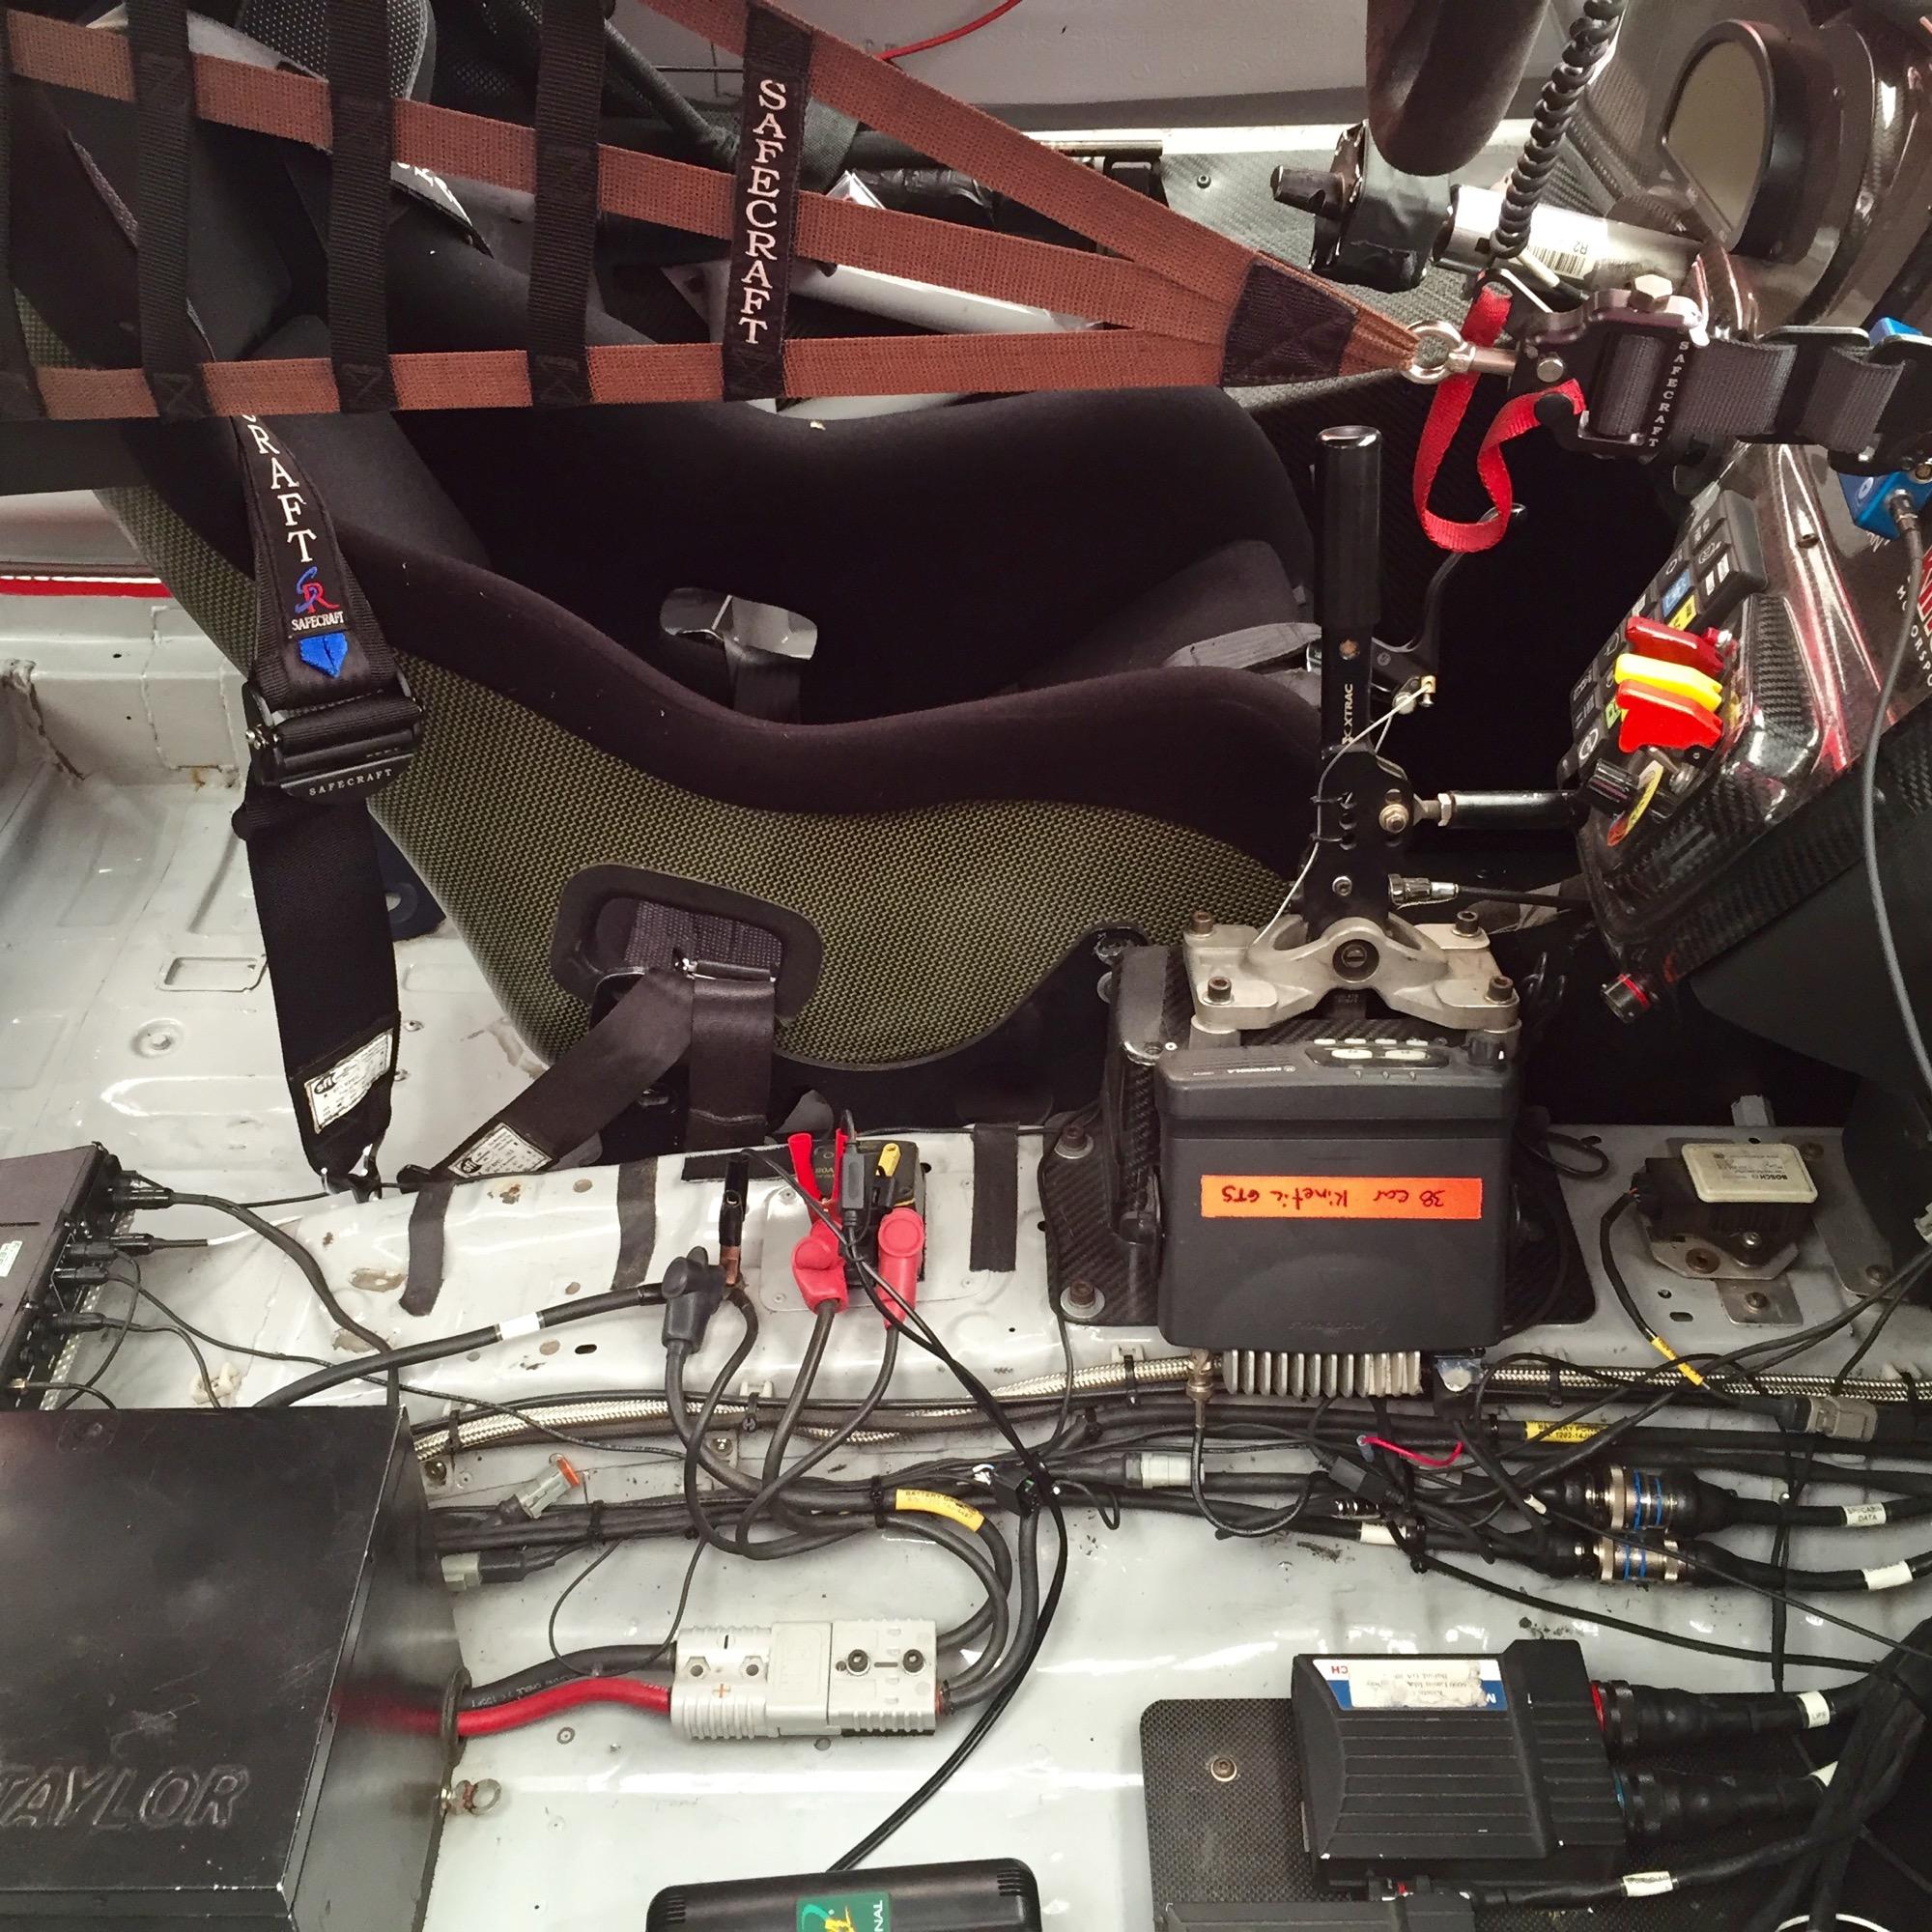 2012 Kia Optima Transmission: Meet The Racing Kia Optima Turbos